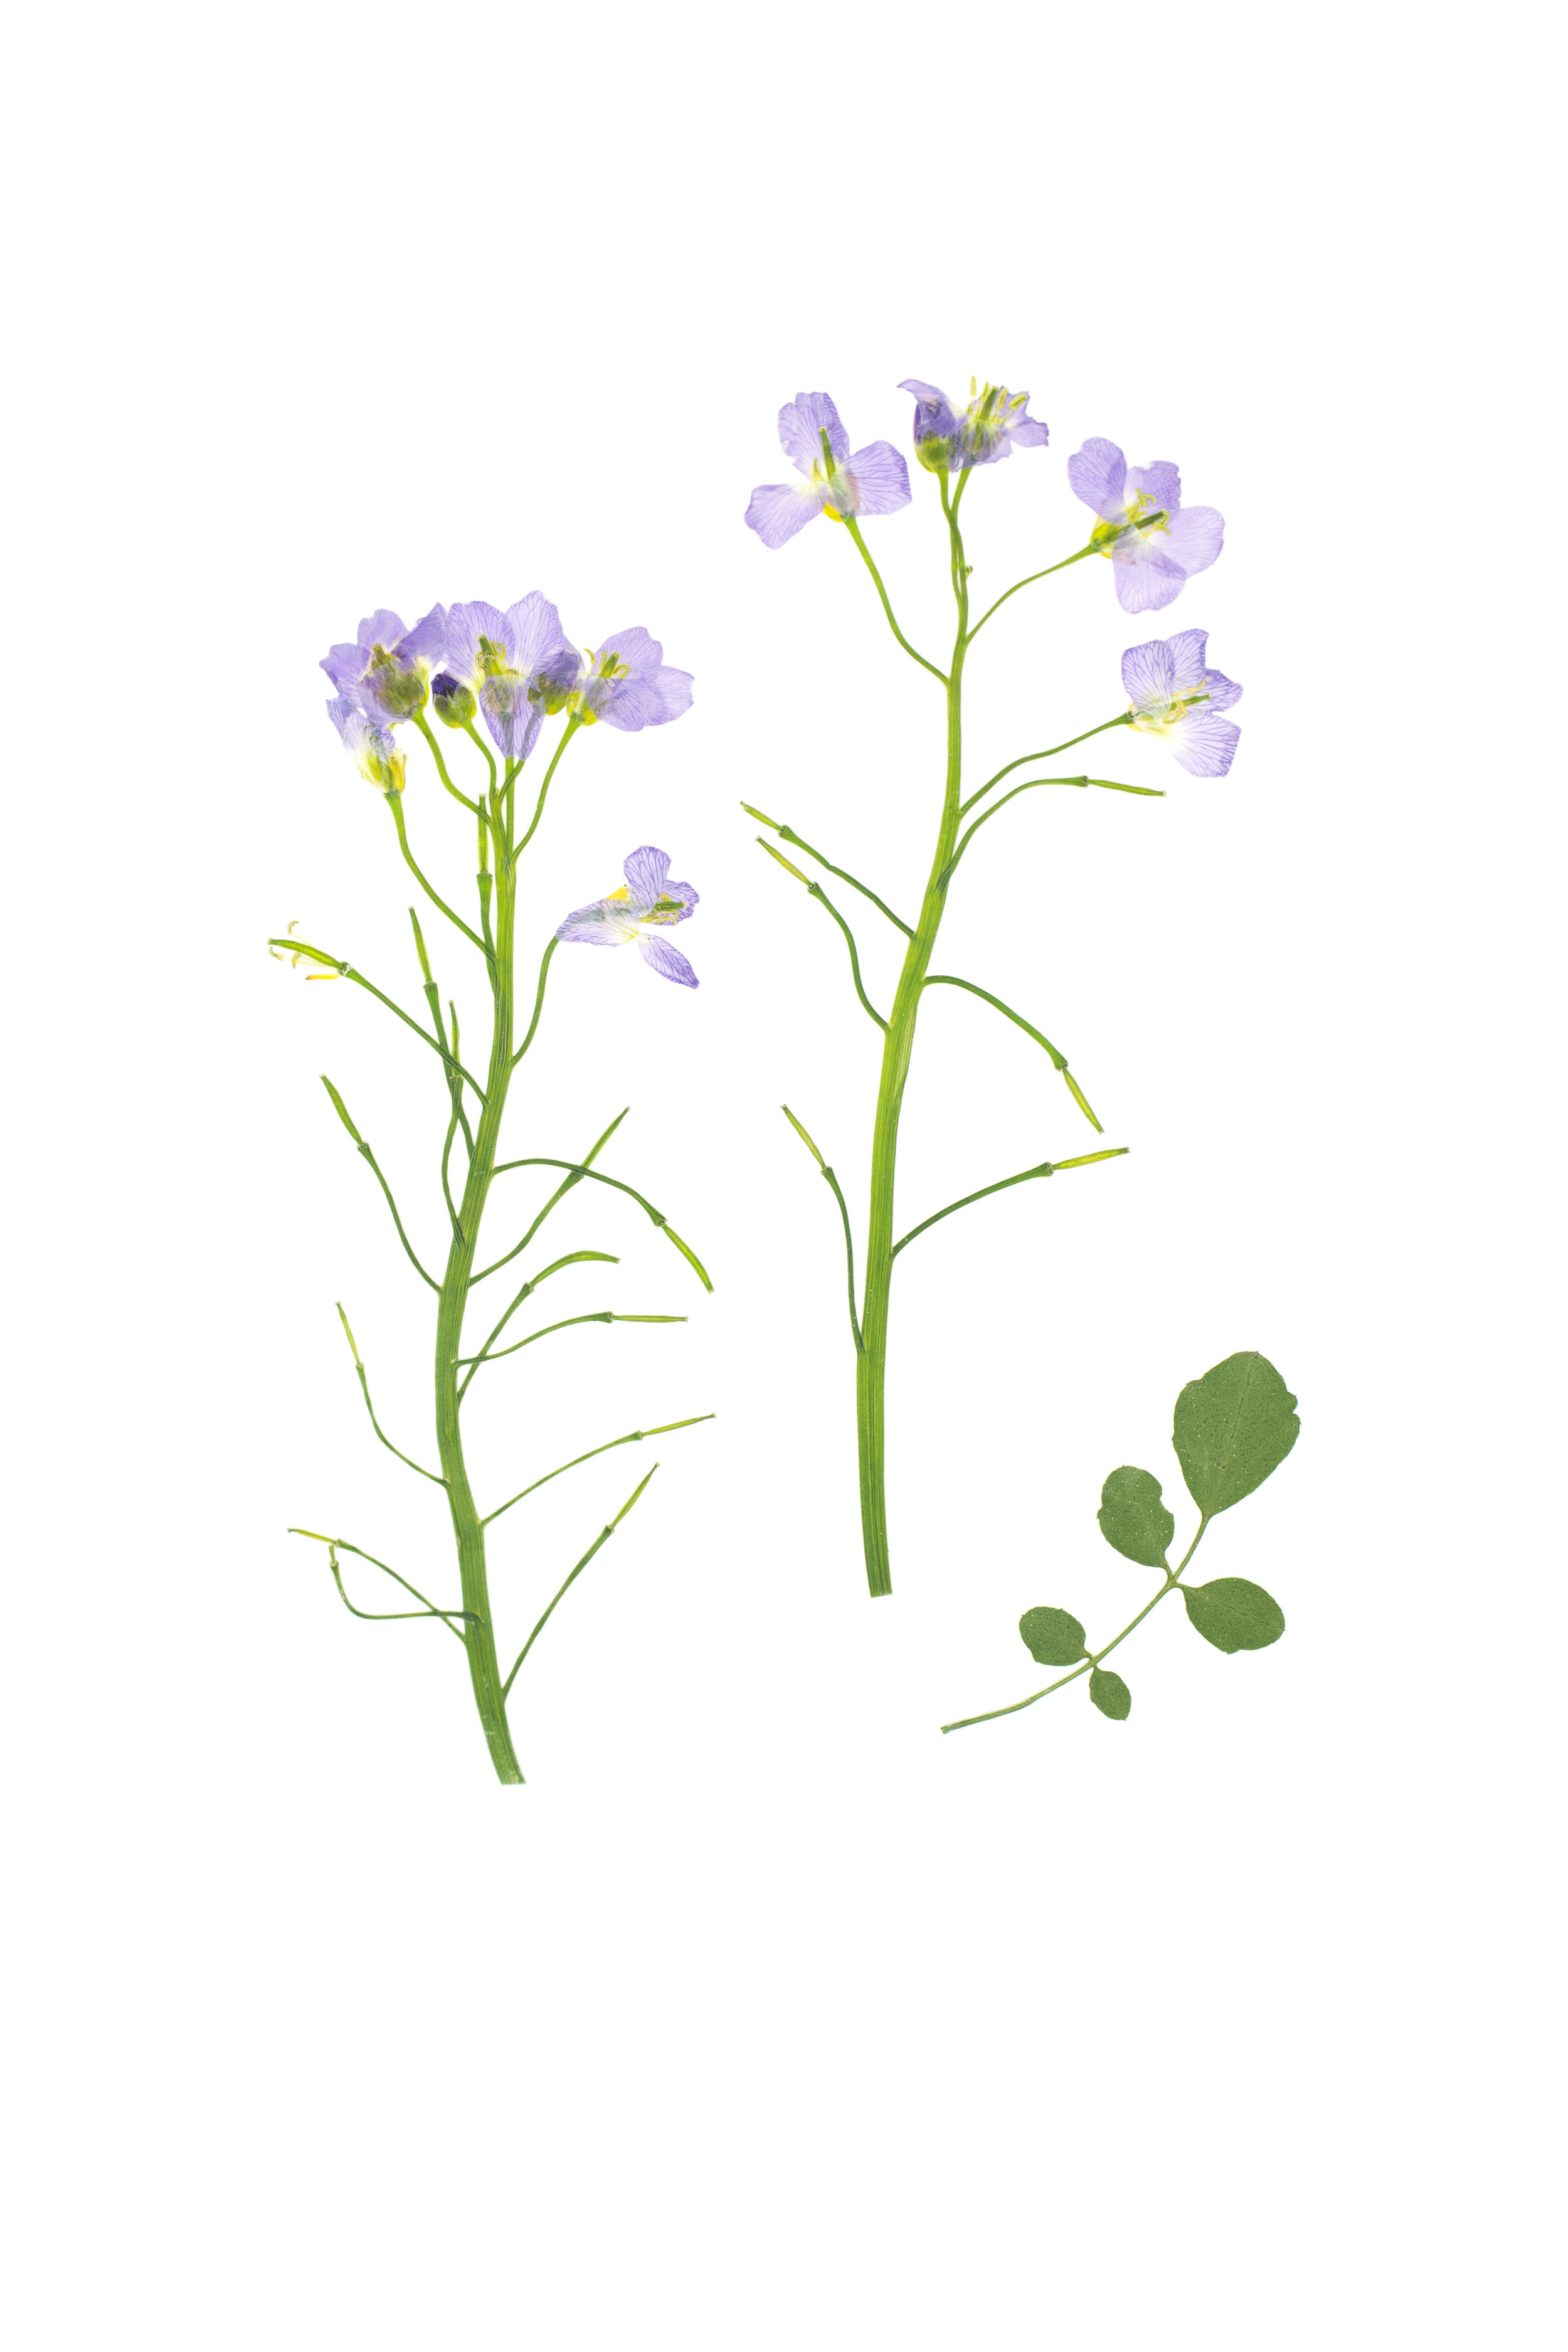 Cuckoo Flower / Cardamine pratensis